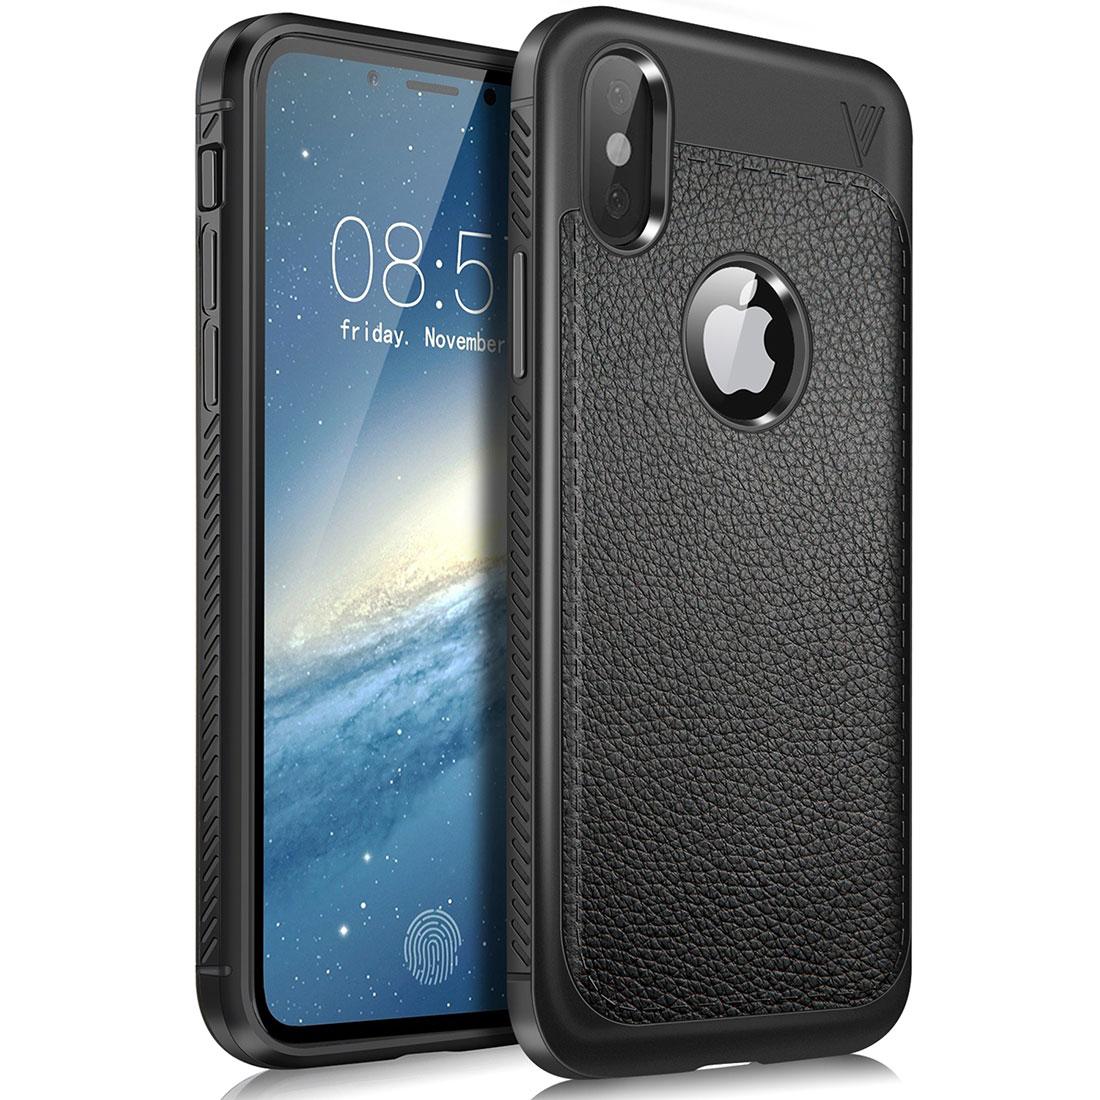 iPhone X Case Silikon TPU Schutzhülle - schwarz